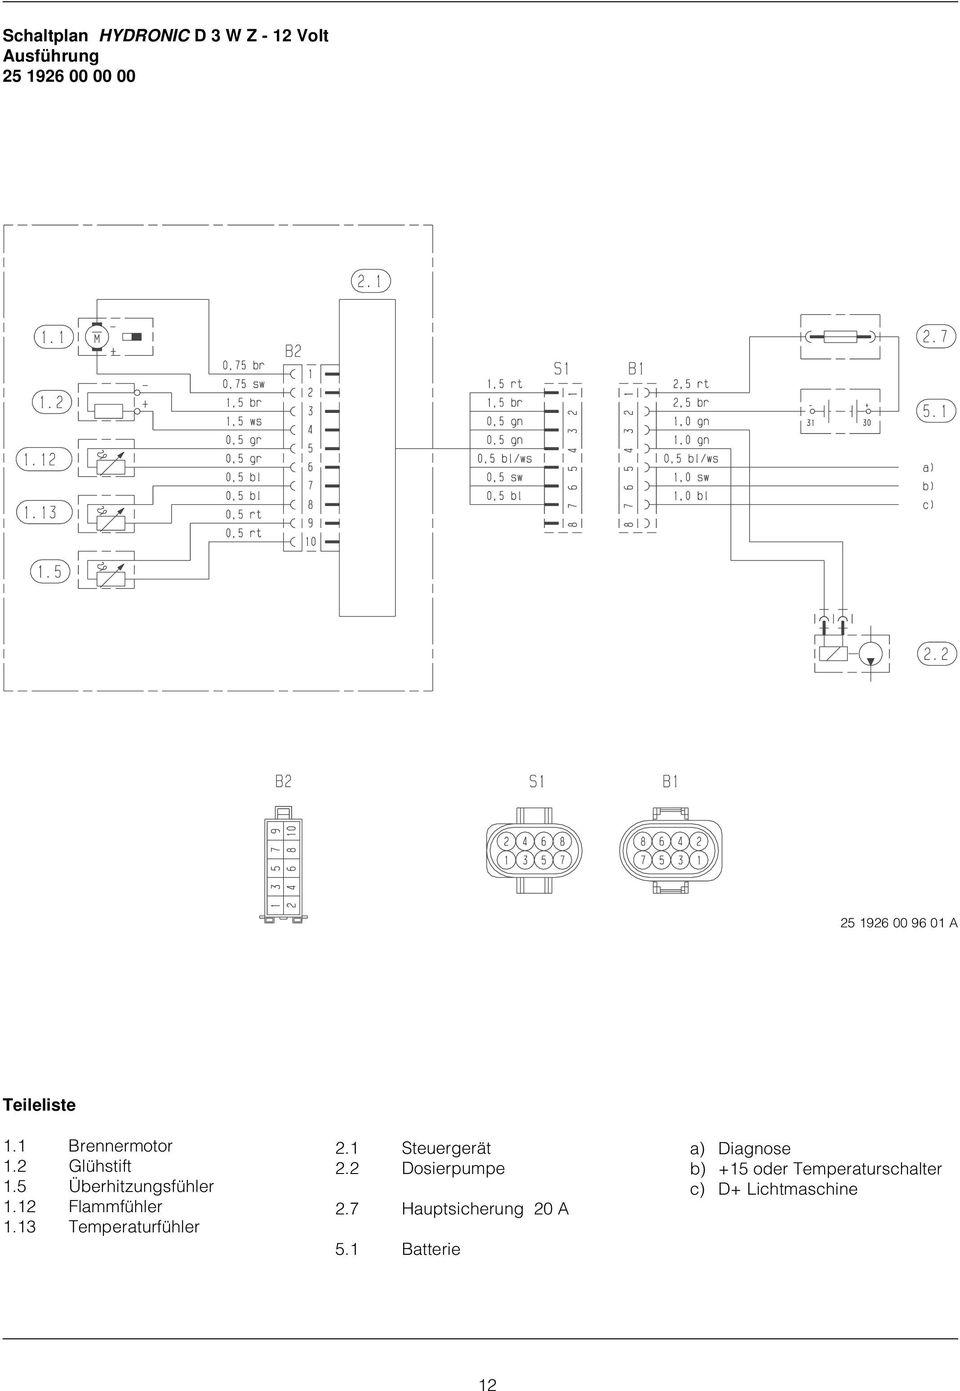 schaltplan hydronic b 4 w